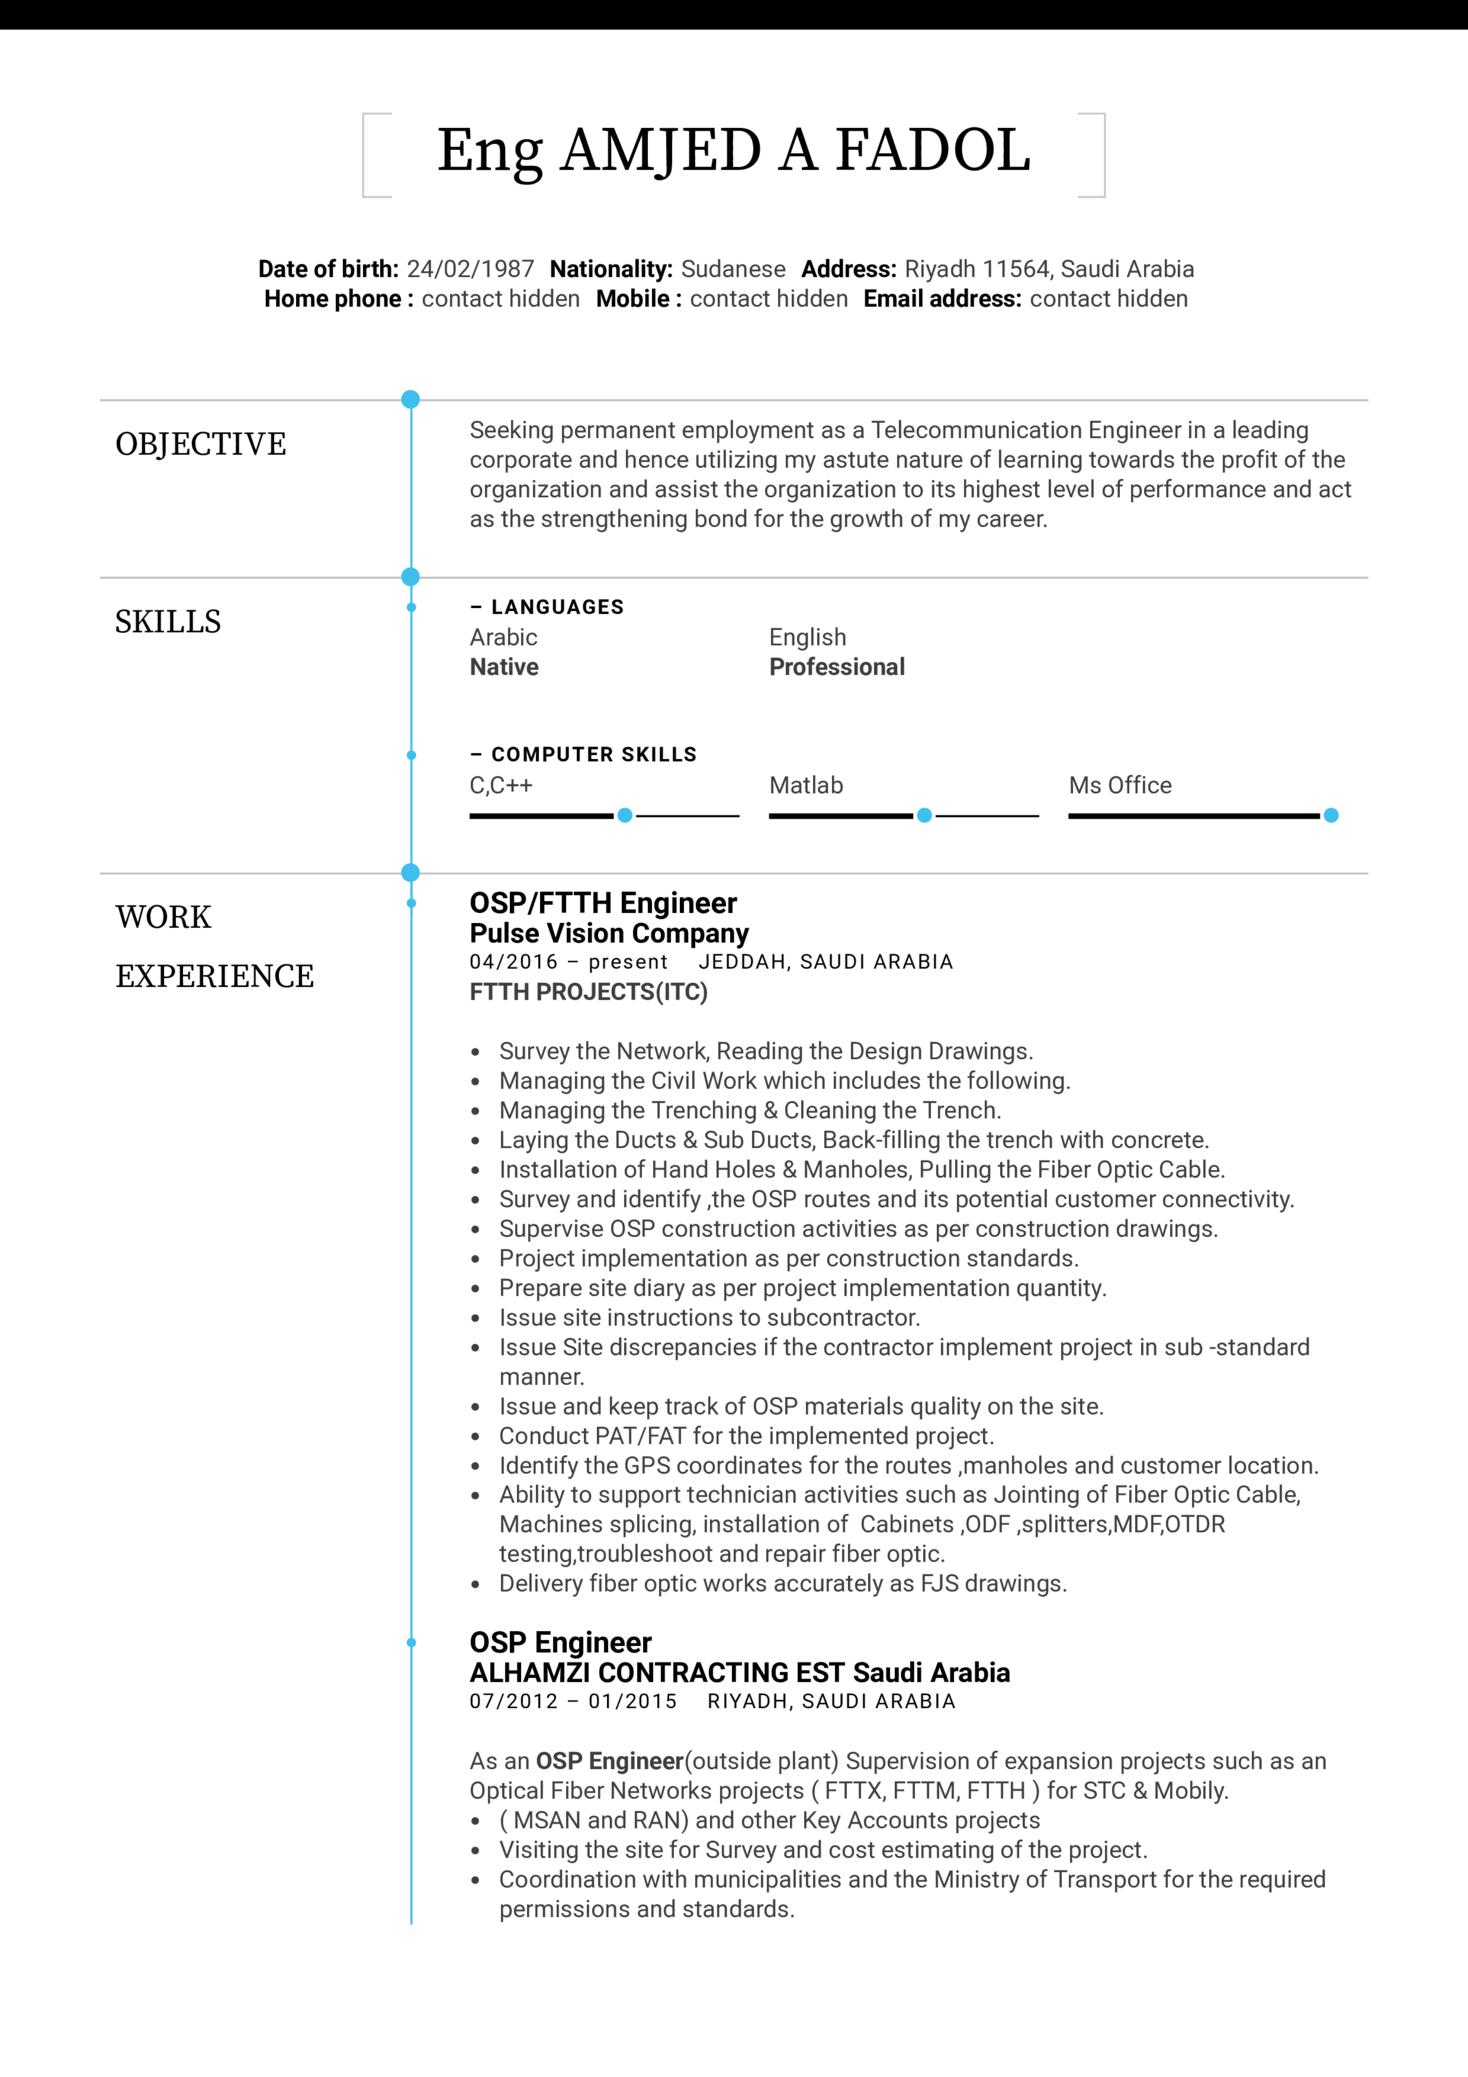 OSP Engineer Resume Template (Part 1)